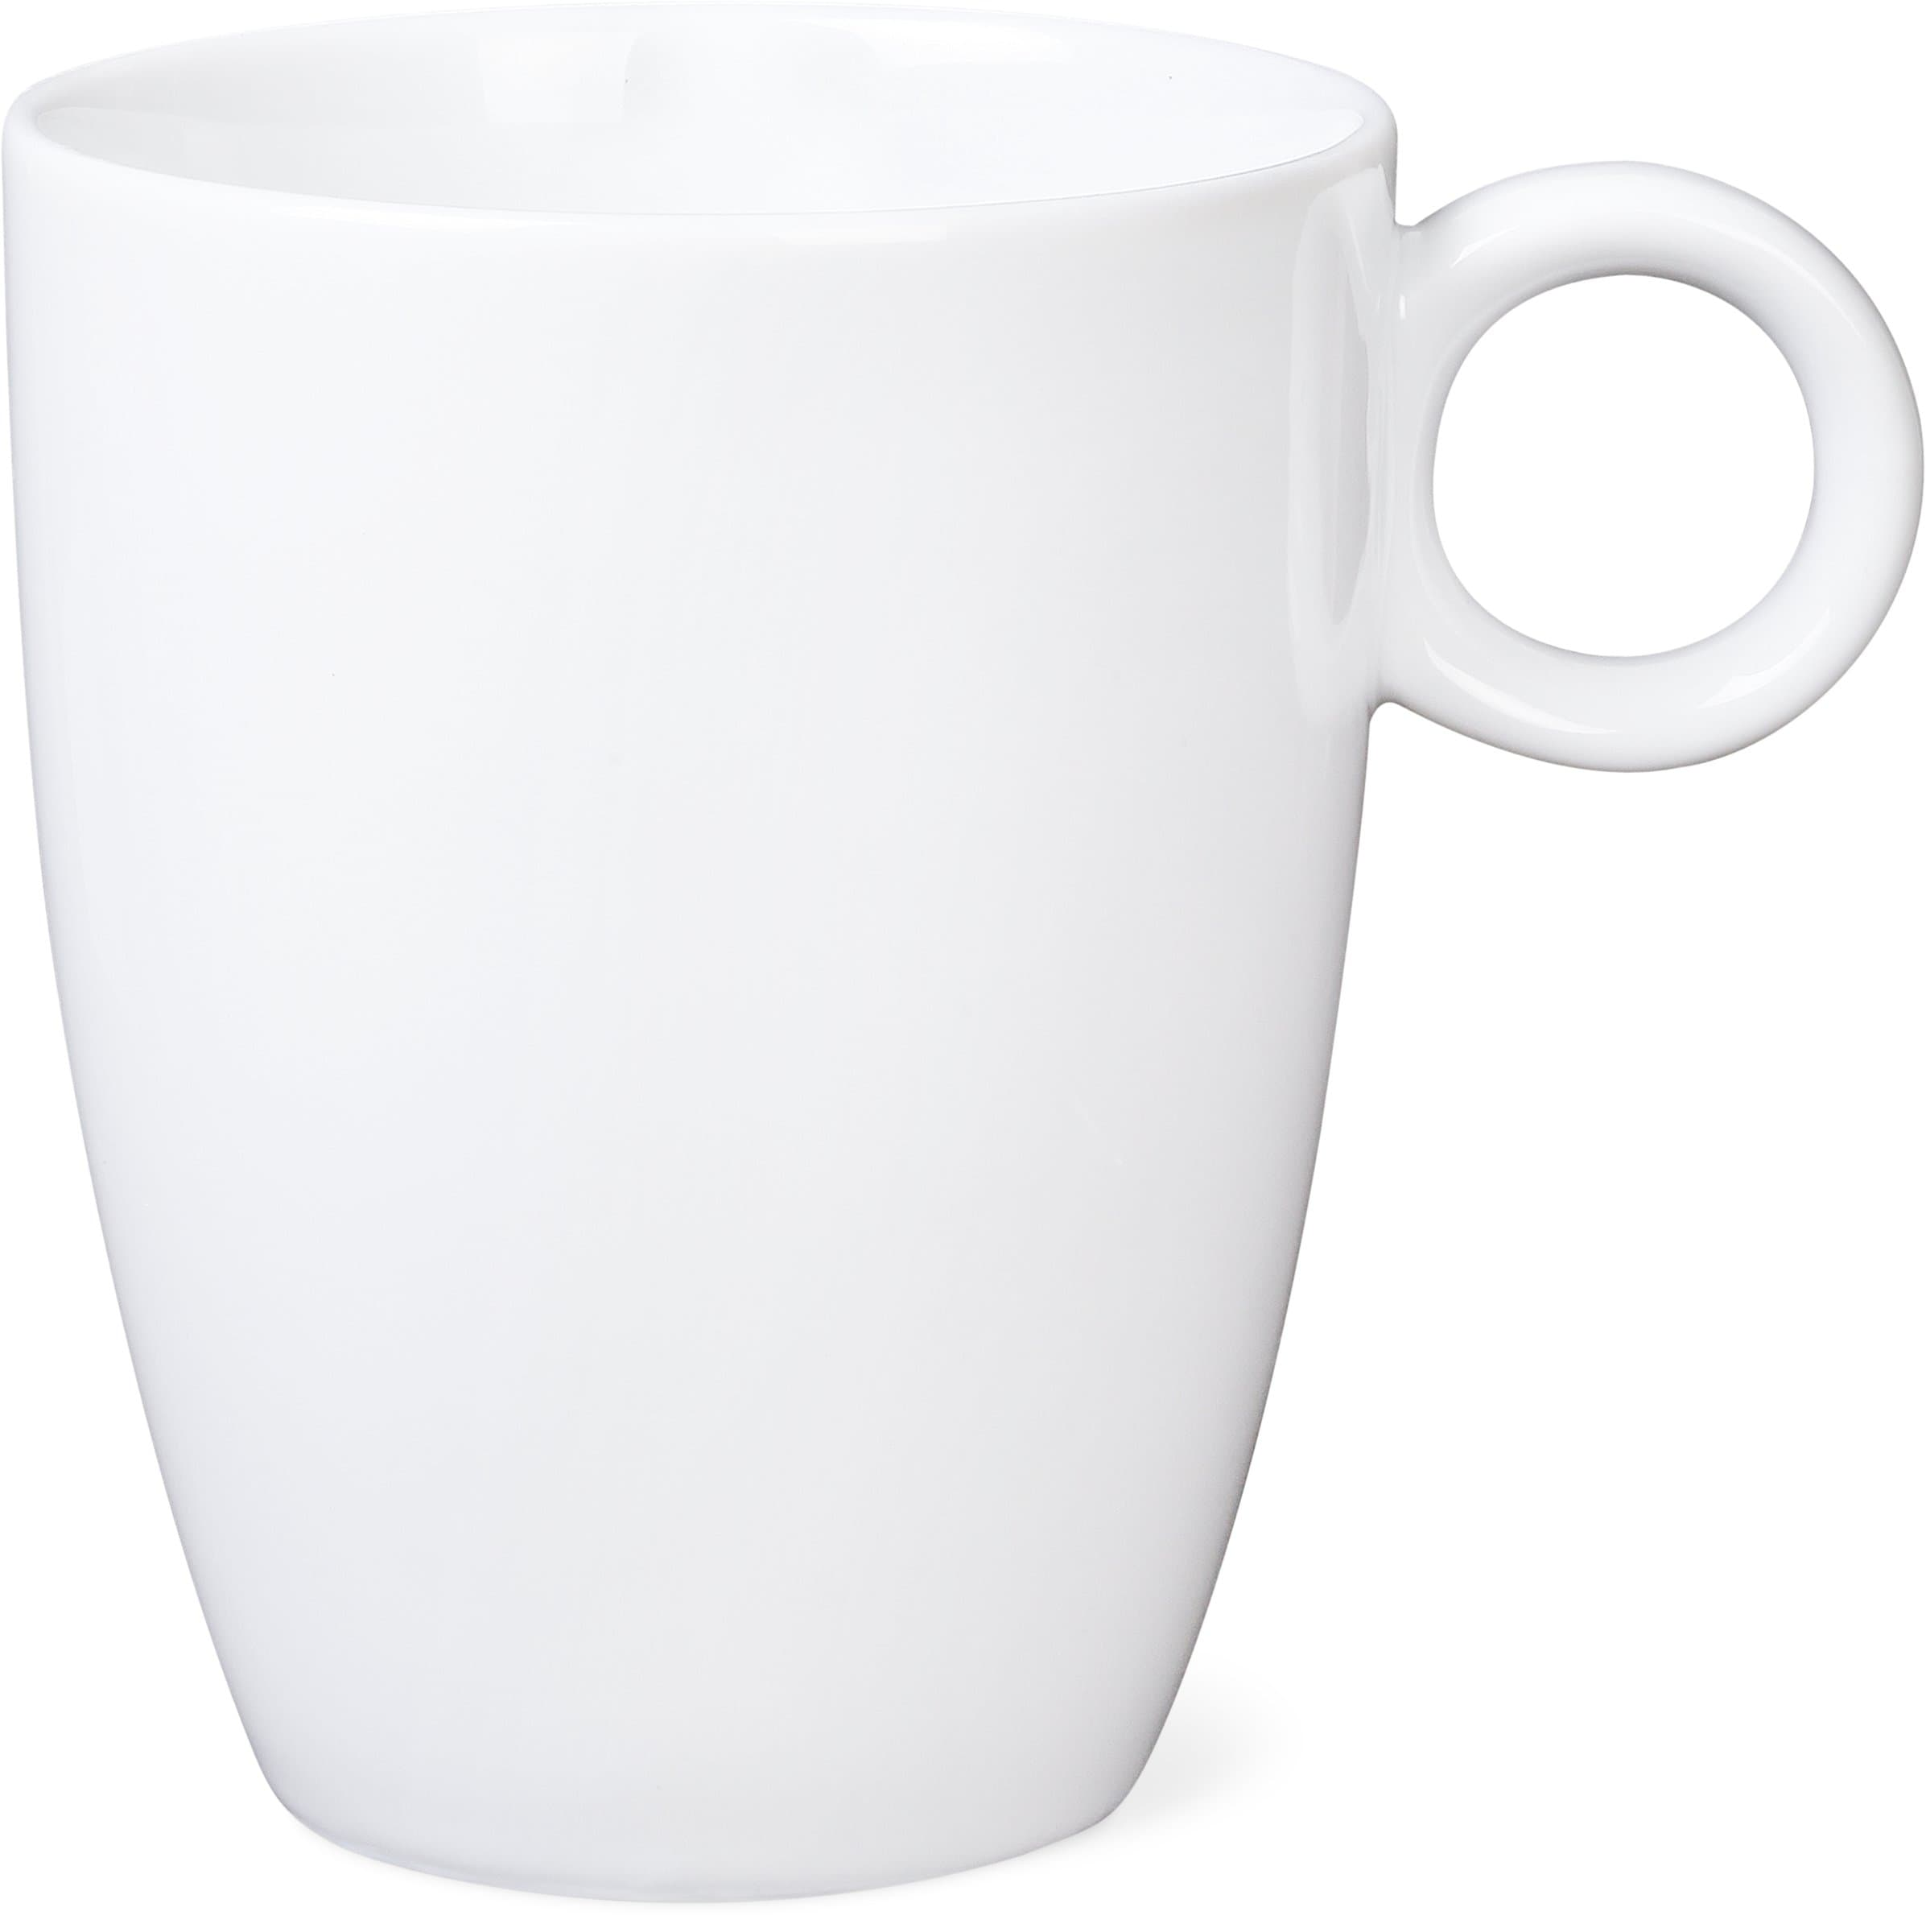 Cucina & Tavola Mug gross